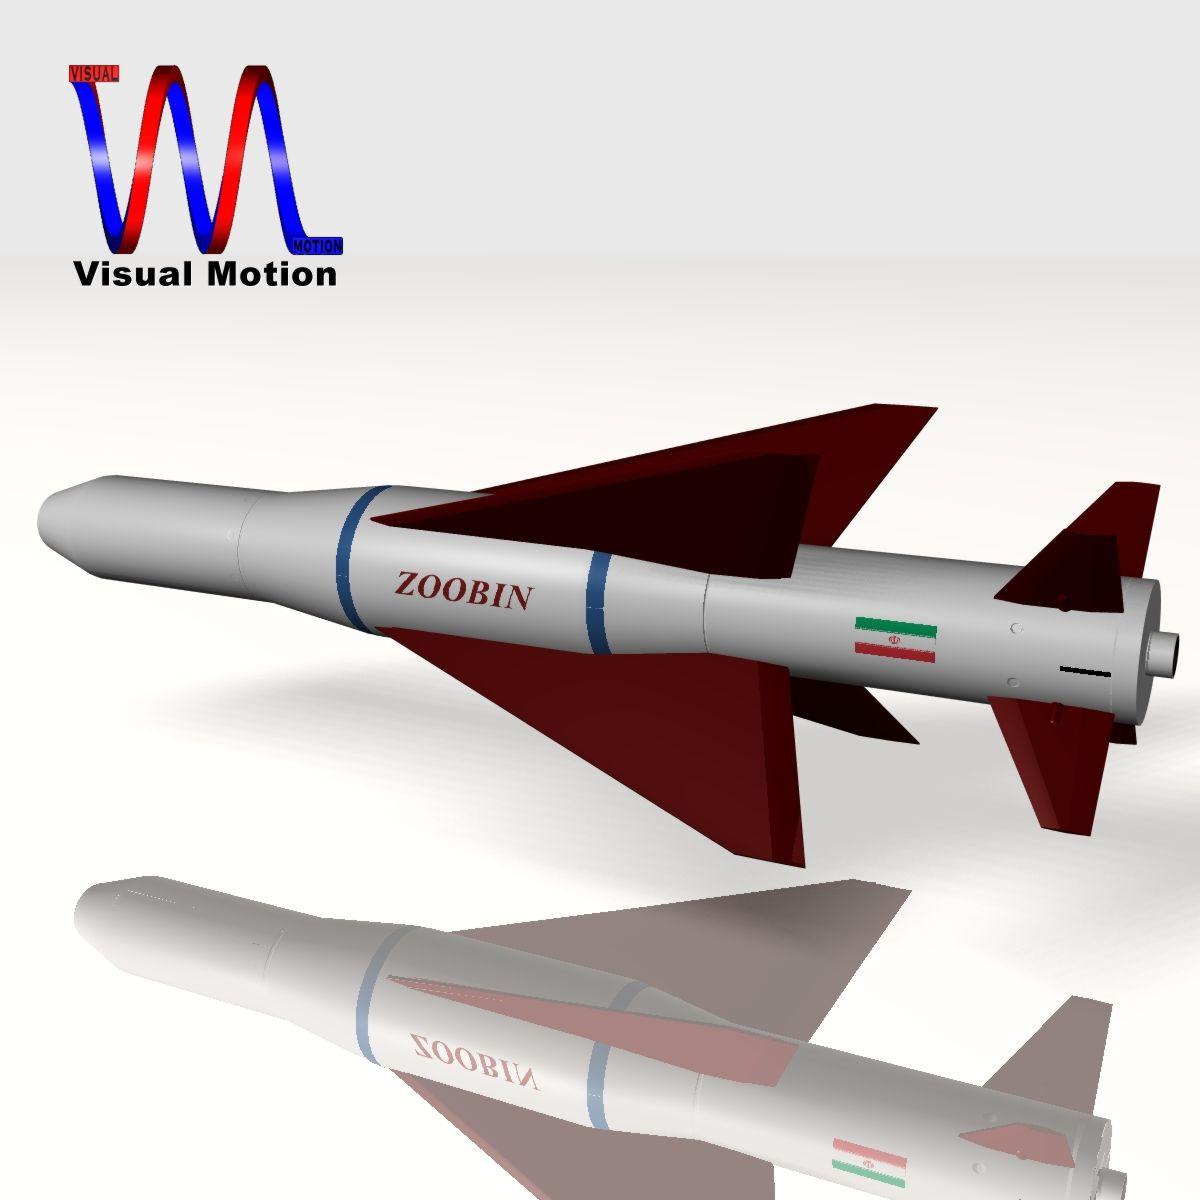 iranian agm-379 zoobin asm missile 3d model 3ds dxf fbx blend cob dae x obj 150578